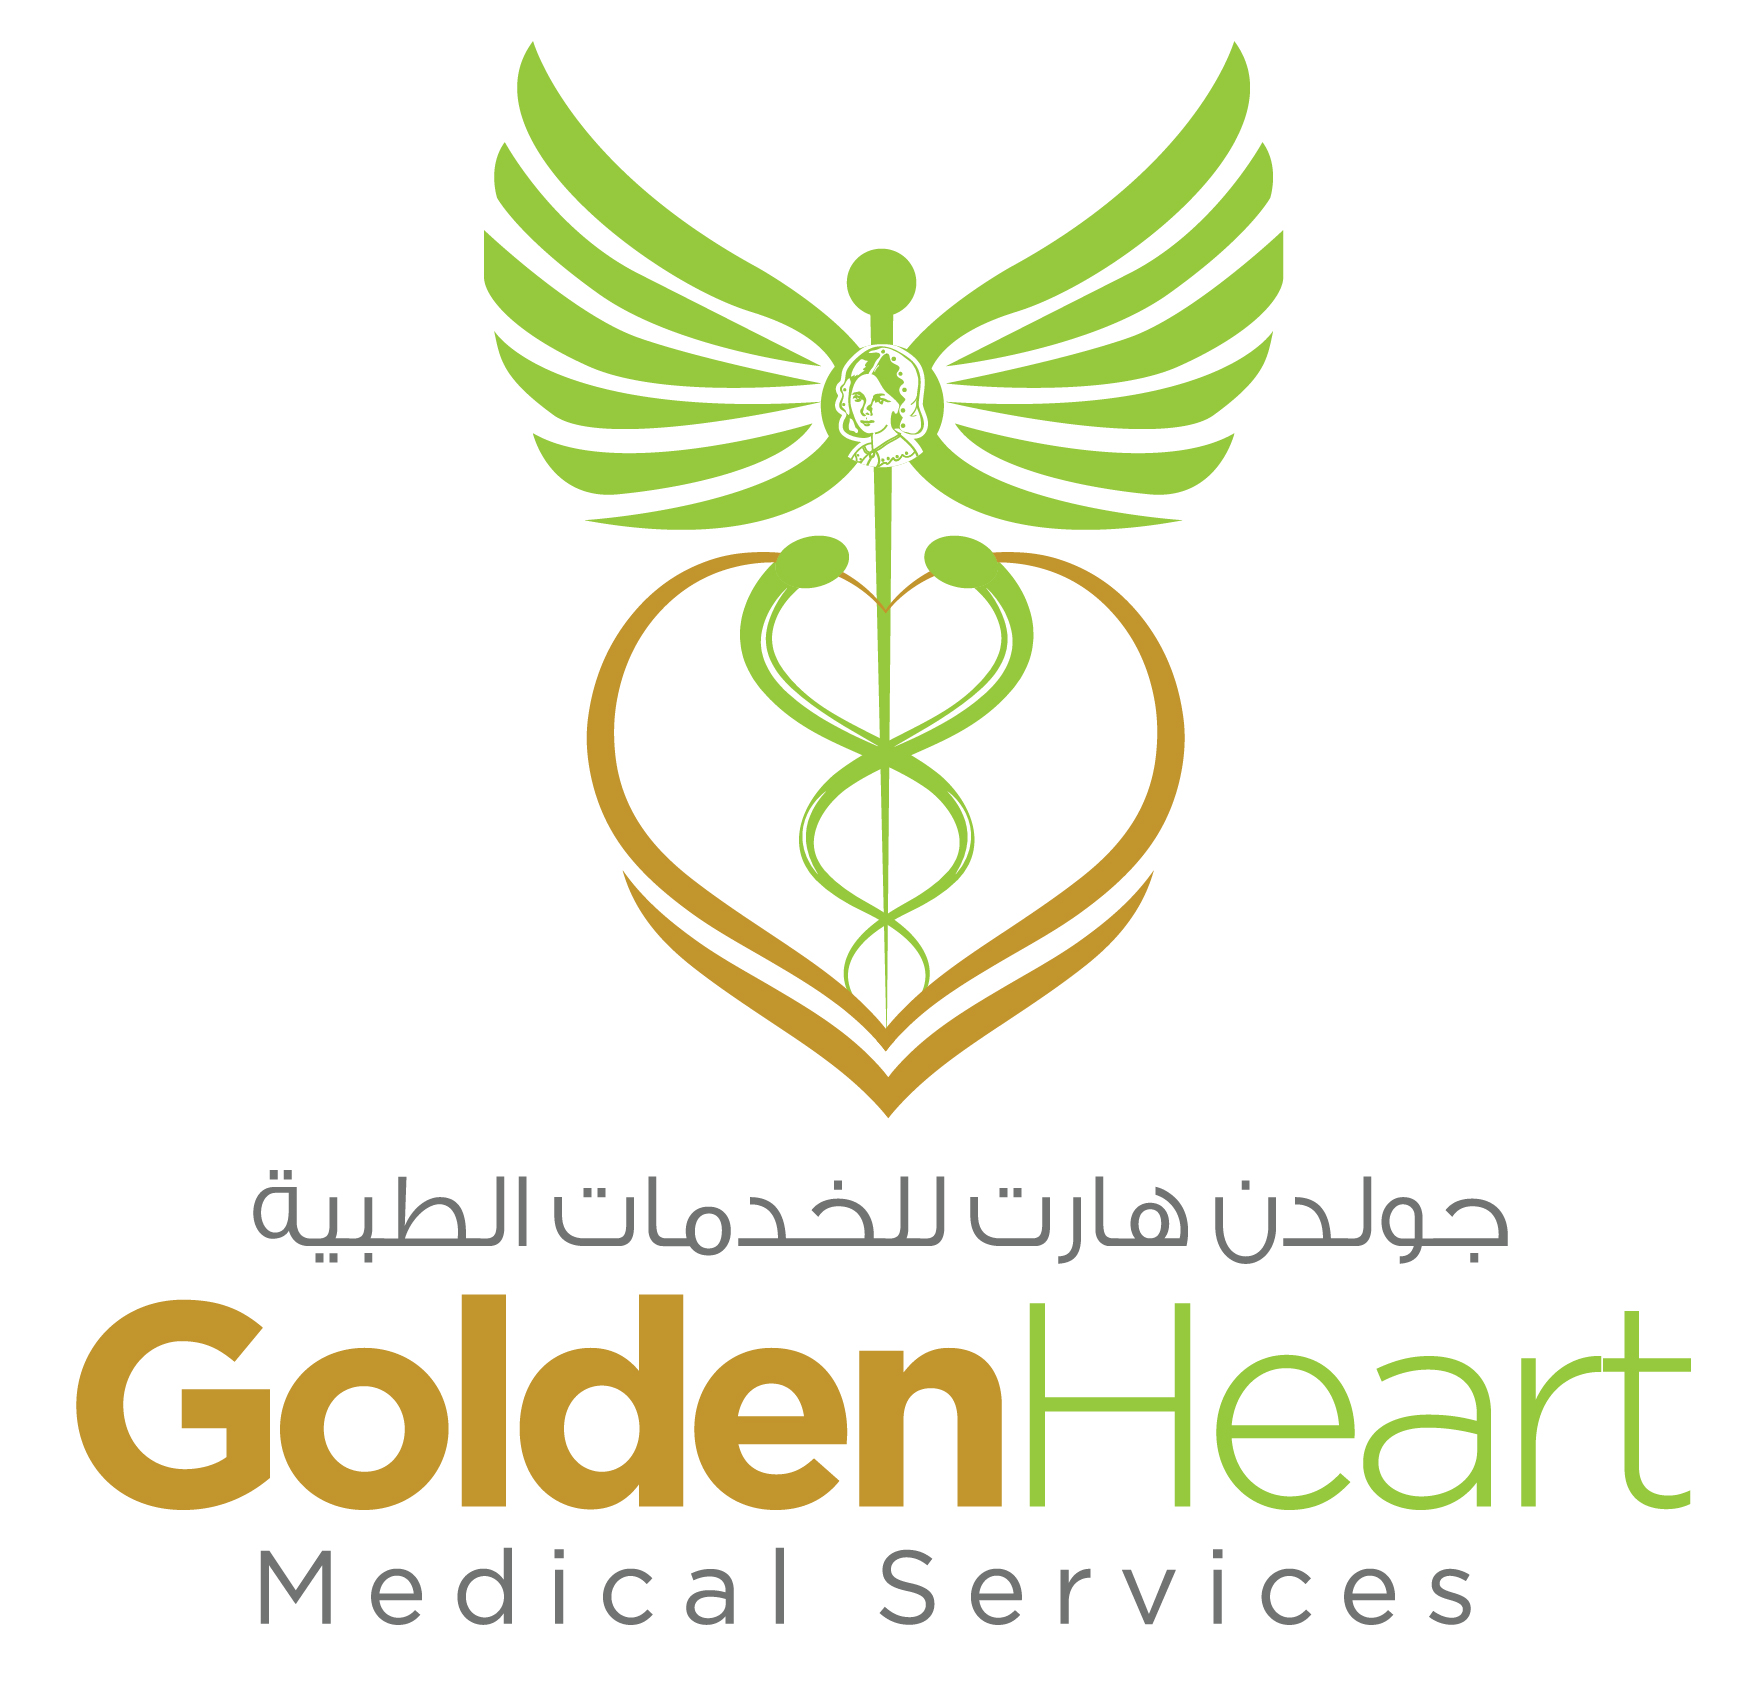 Golden Heart Medical Services